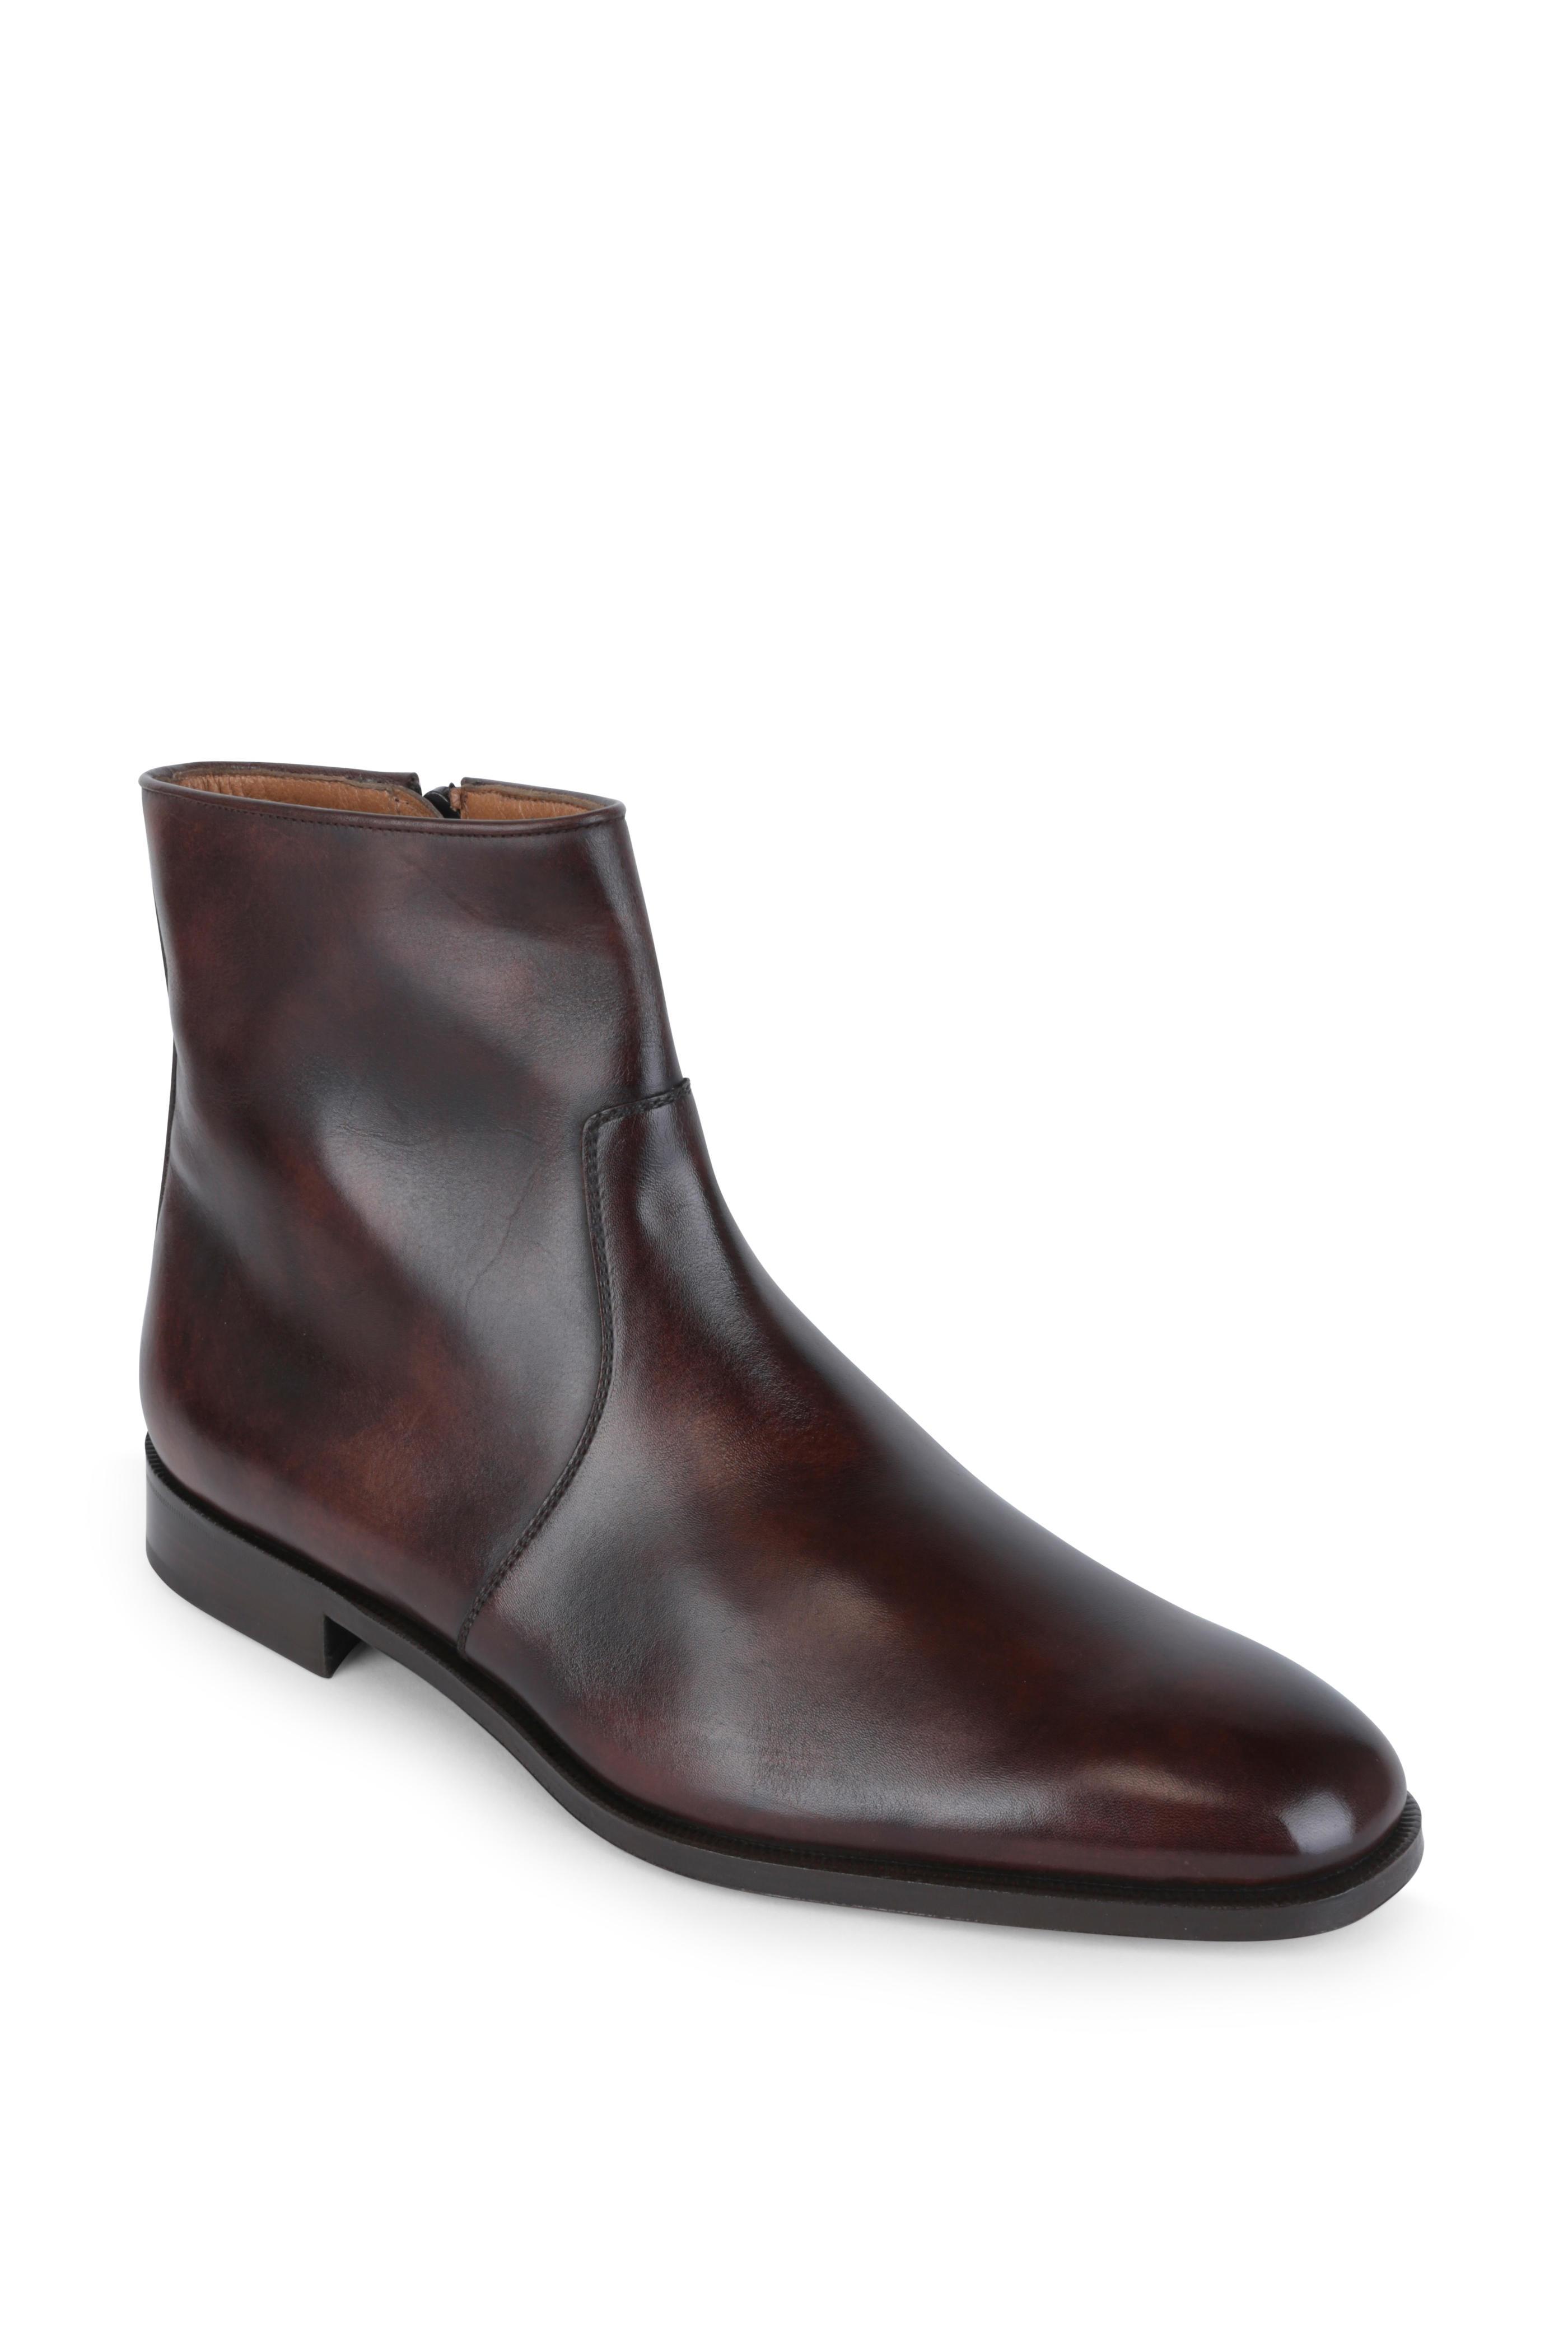 Gravati Bradica Dark Brown Burnished Leather Boot